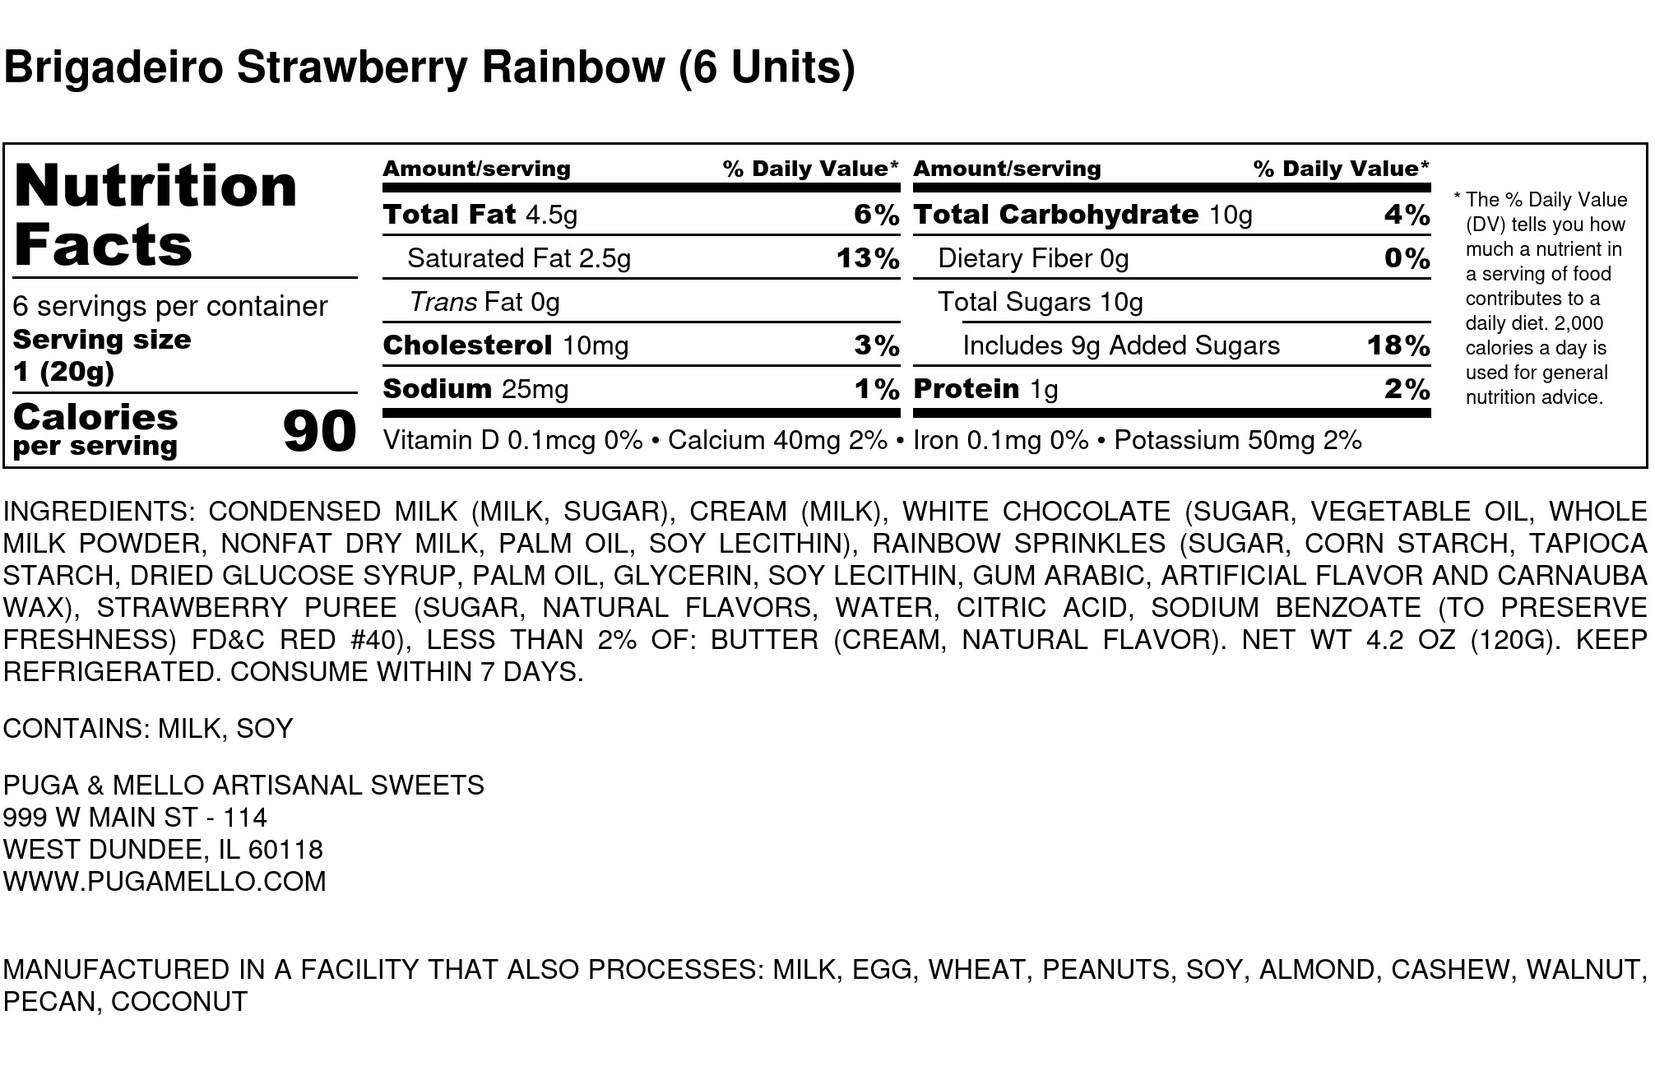 Brigadeiro Strawberry Rainbow (6 Units)